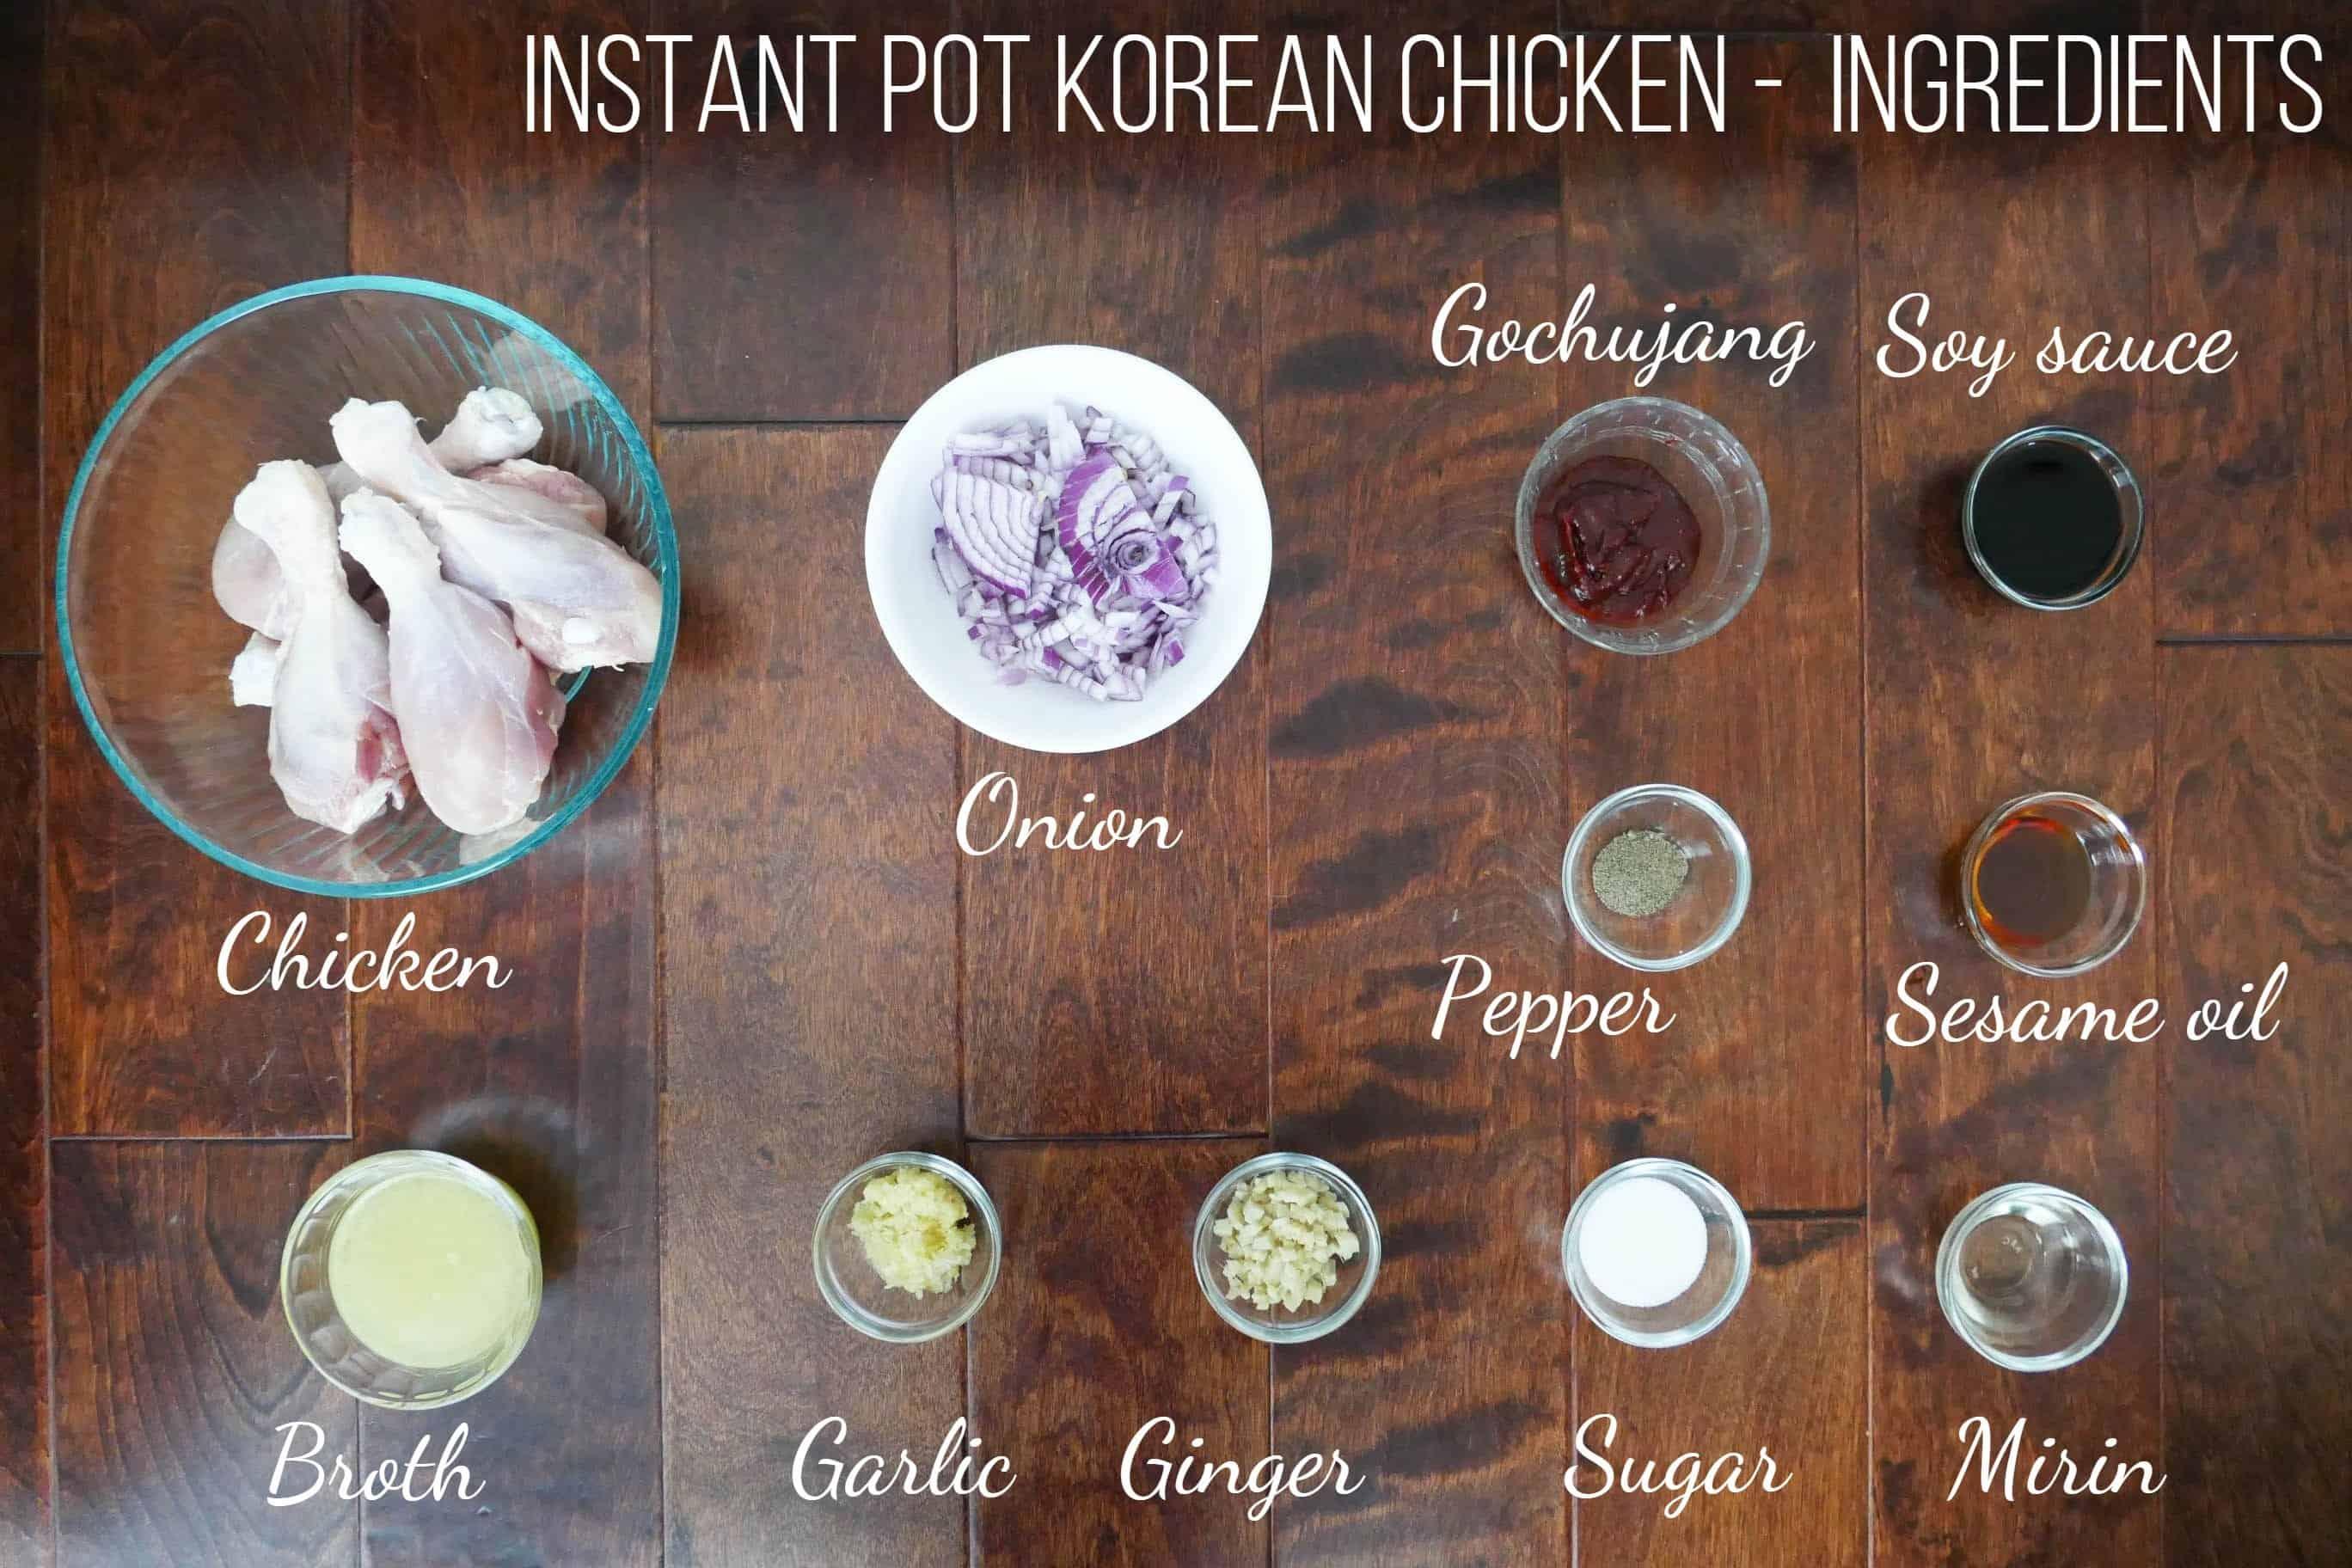 Instant Pot Korean Chicken Ingredients - chicken, onion, gochujang, soy sauce, pepper, sesame oil, broth, garlic, ginger, sugar, mirin - Paint the Kitchen Red